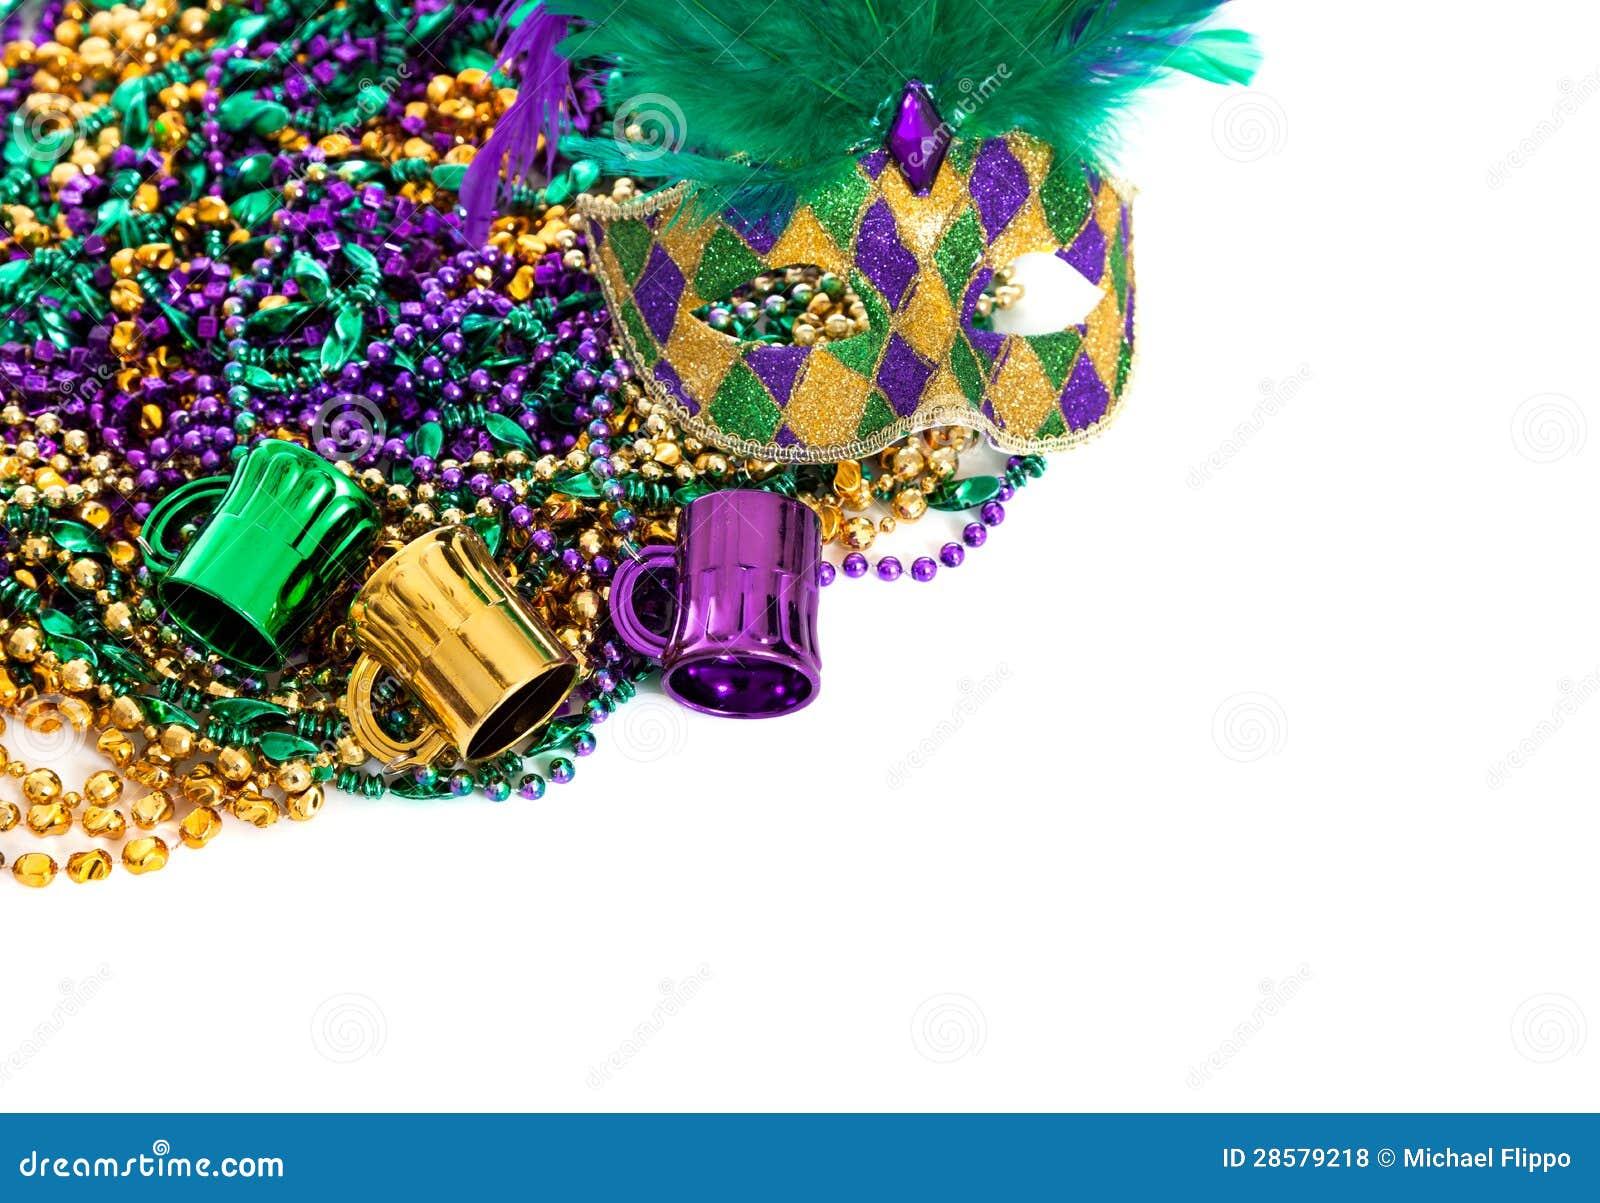 Mardi Gras Beads Border Clip Art Mardi gras beads on a white